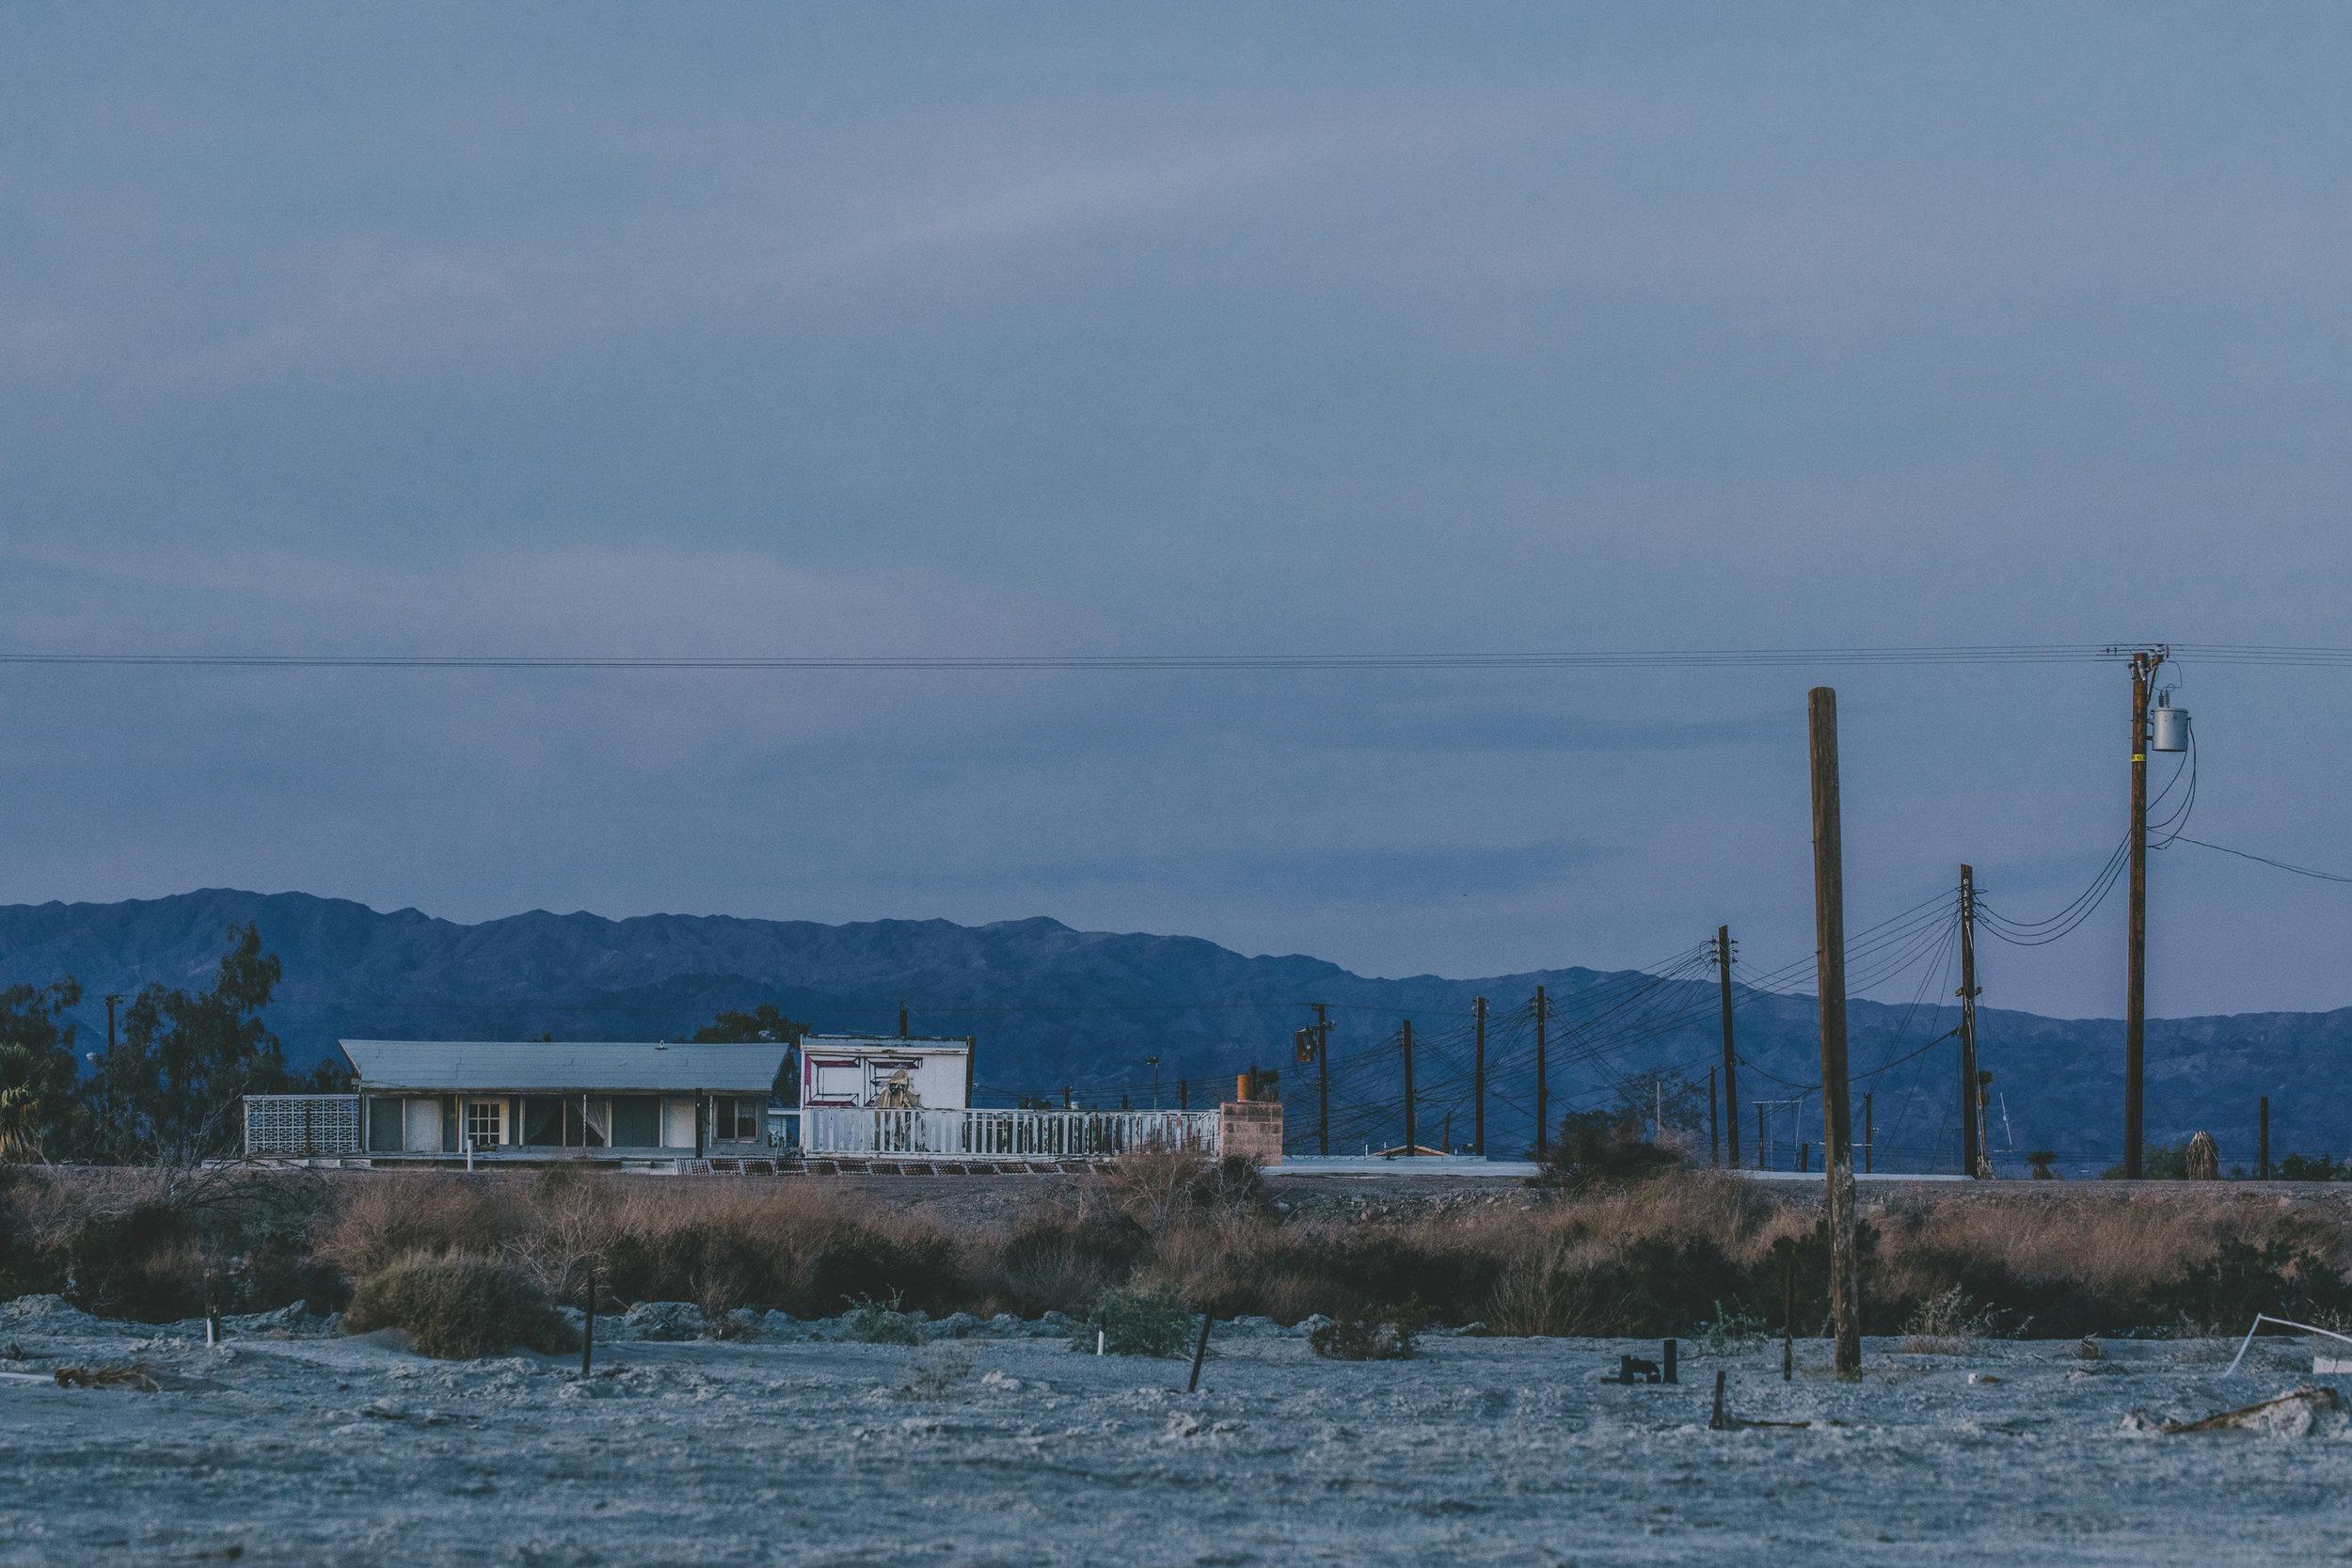 salton-sea-bombay-beach-180117-1463.jpg